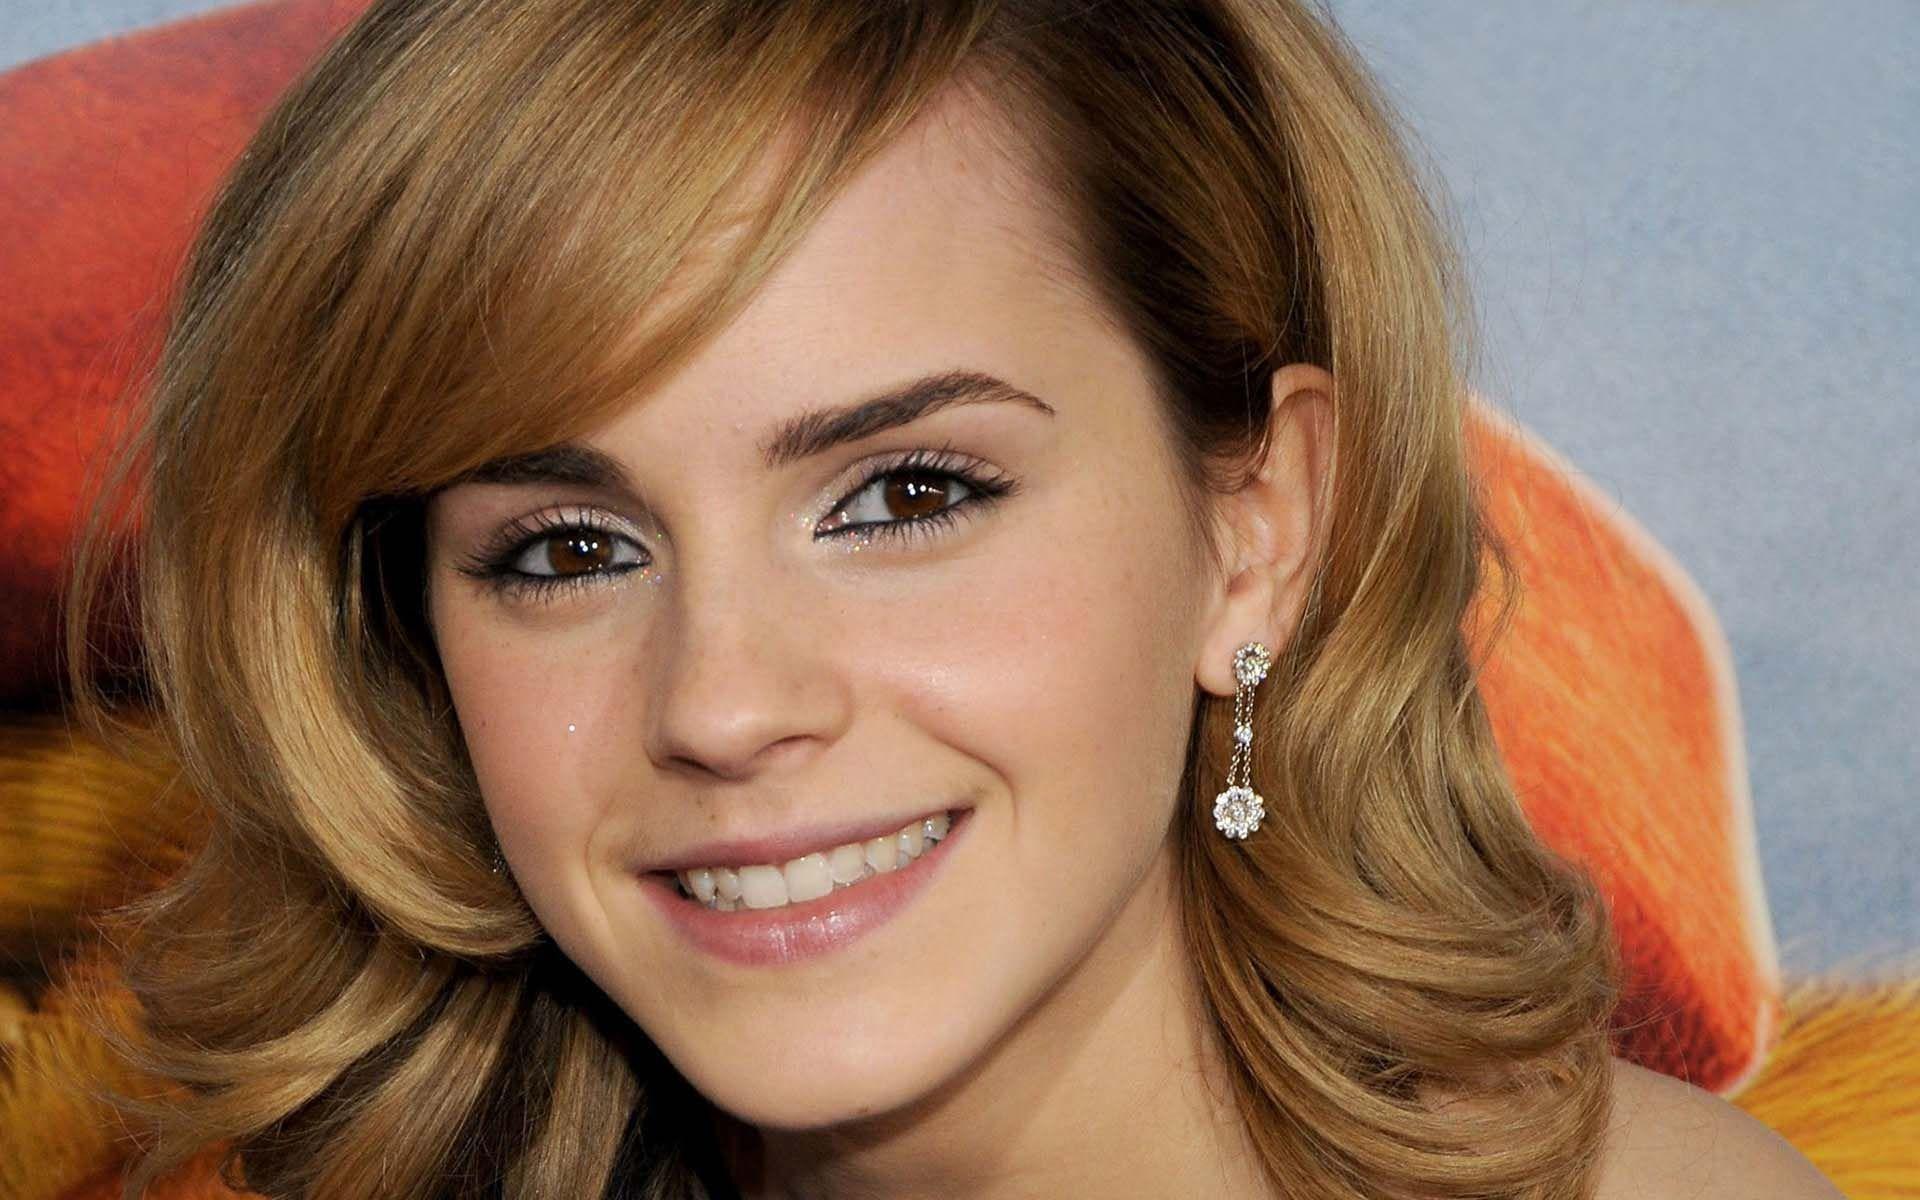 Sexy Emma Watson - Wallpaper, High Definition, High